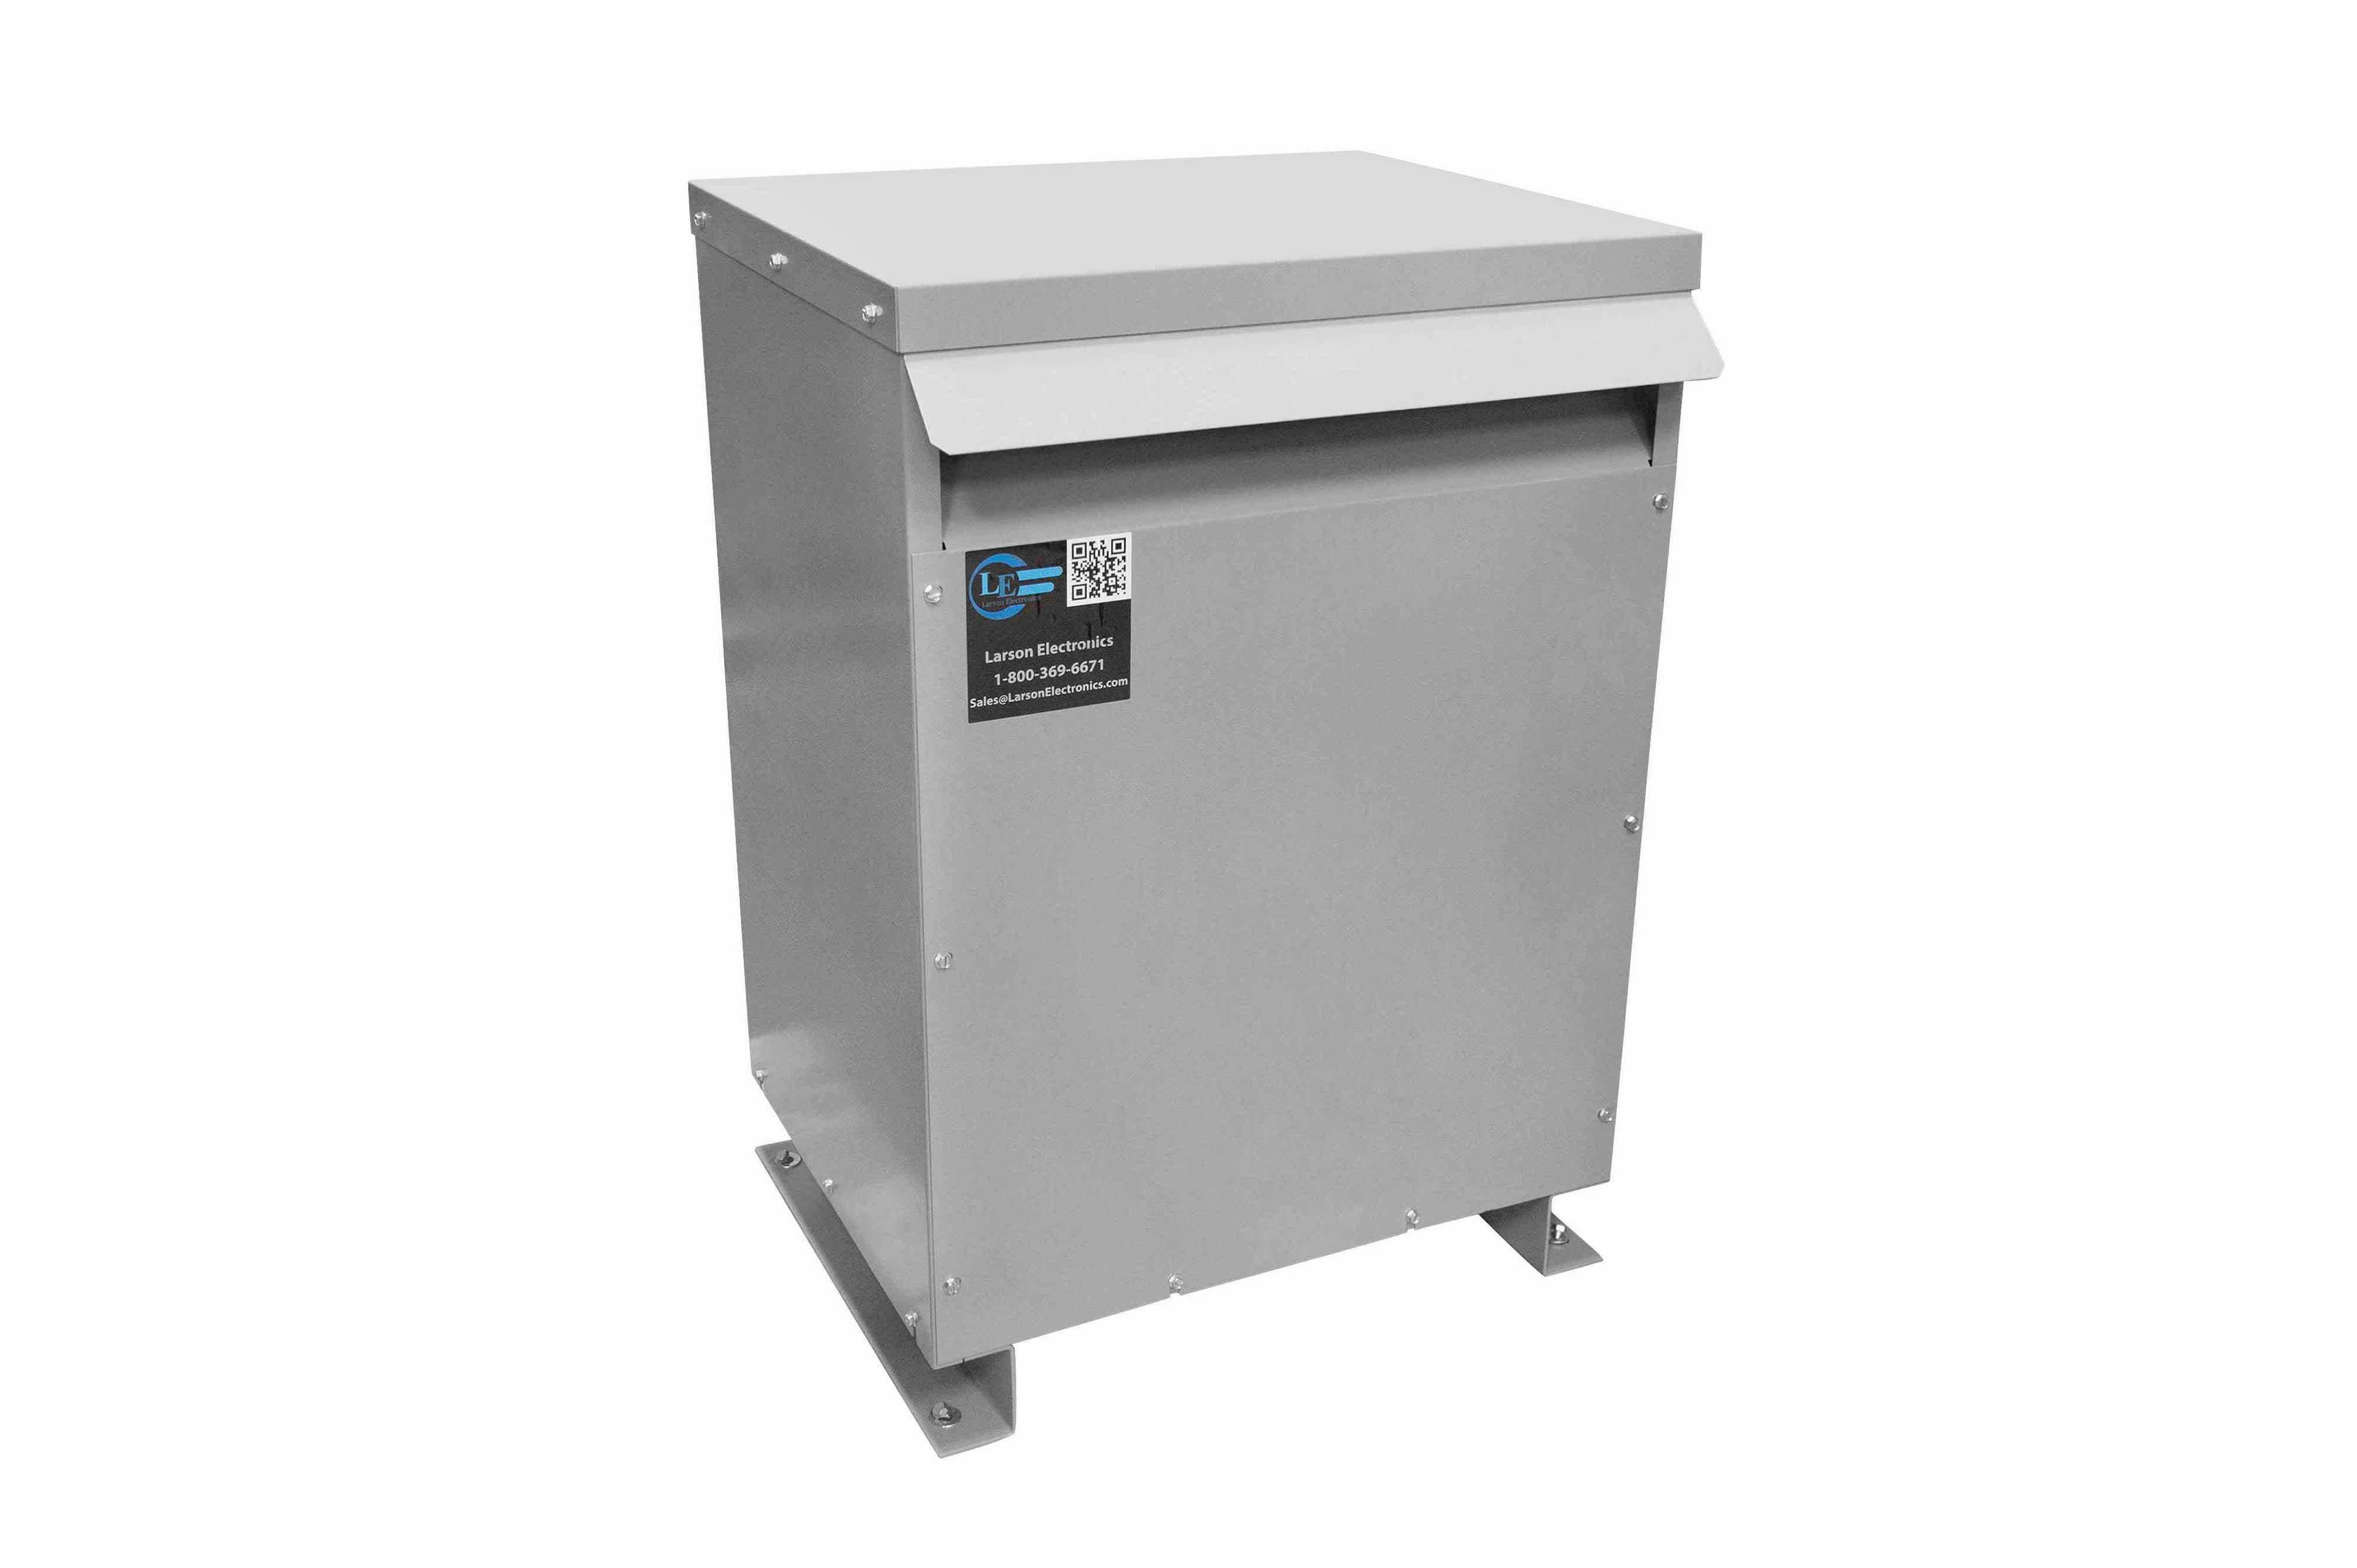 110 kVA 3PH Isolation Transformer, 575V Wye Primary, 380V Delta Secondary, N3R, Ventilated, 60 Hz